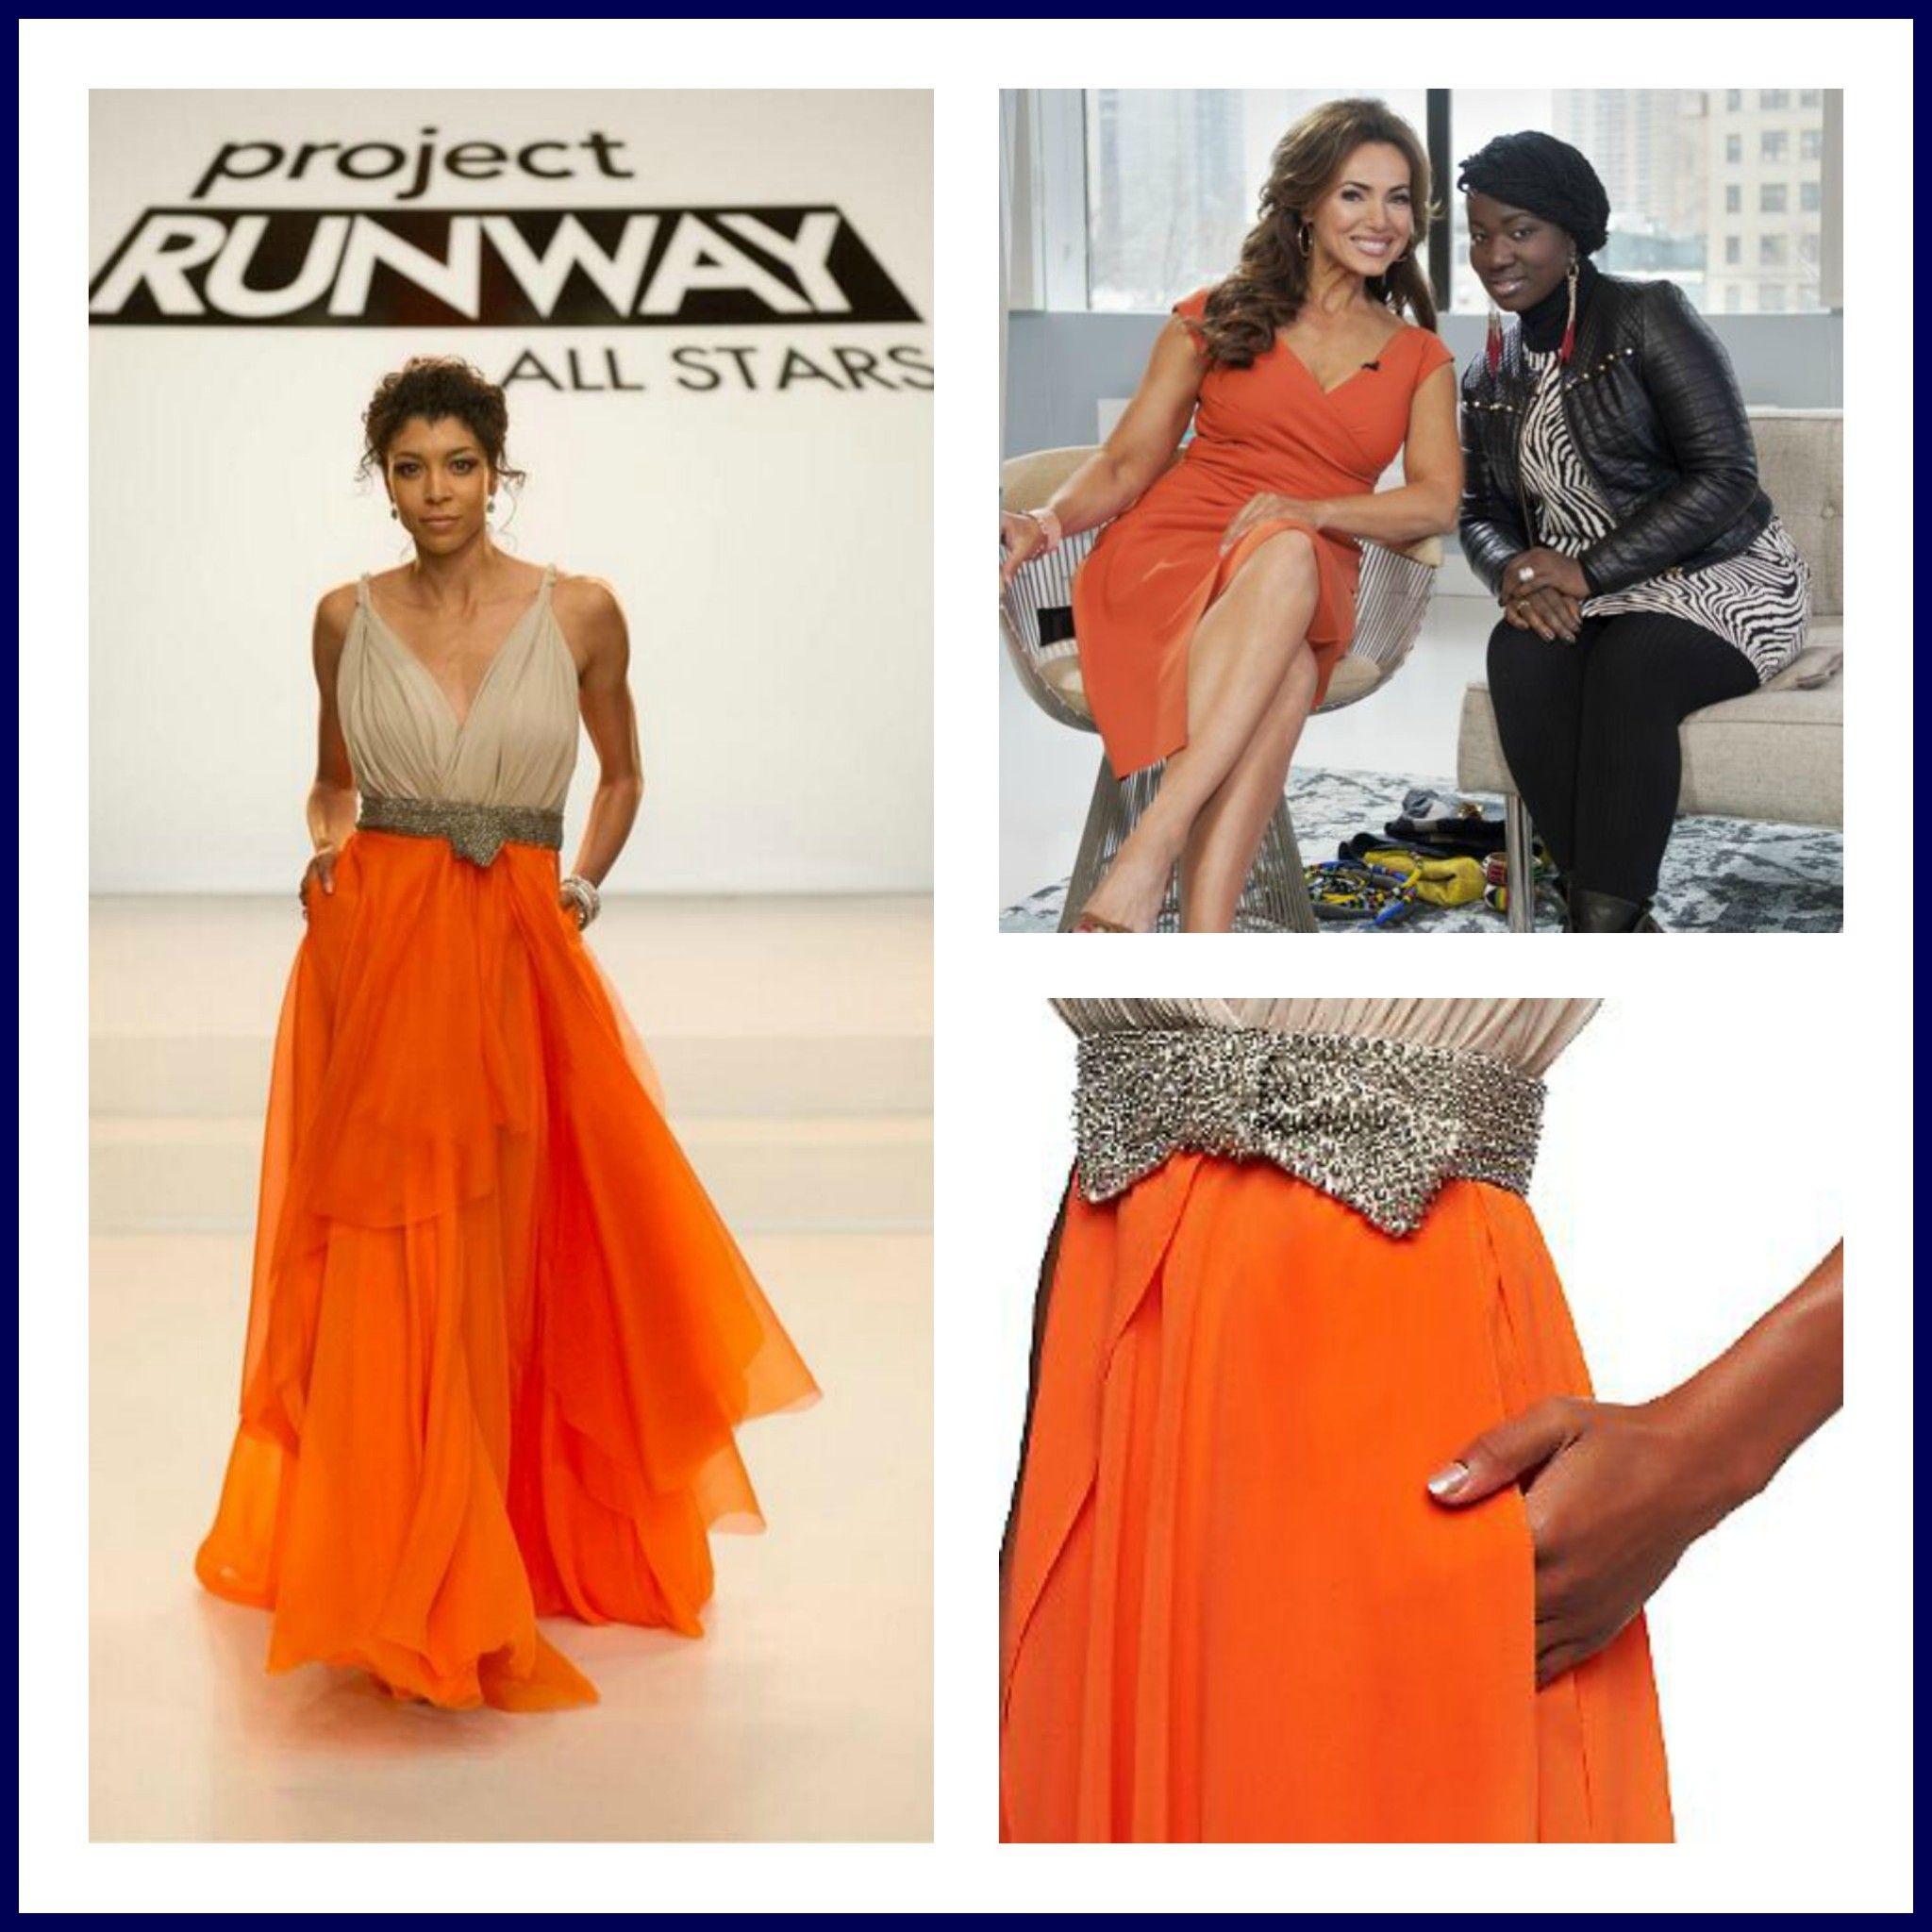 Lisa robertson in wedding dress -  Left Qvc Challenge S Winning Design Top Right Designer Korto Momolu W Qvc Host Lisa Robertson Bottom Right Winning Design S Dres